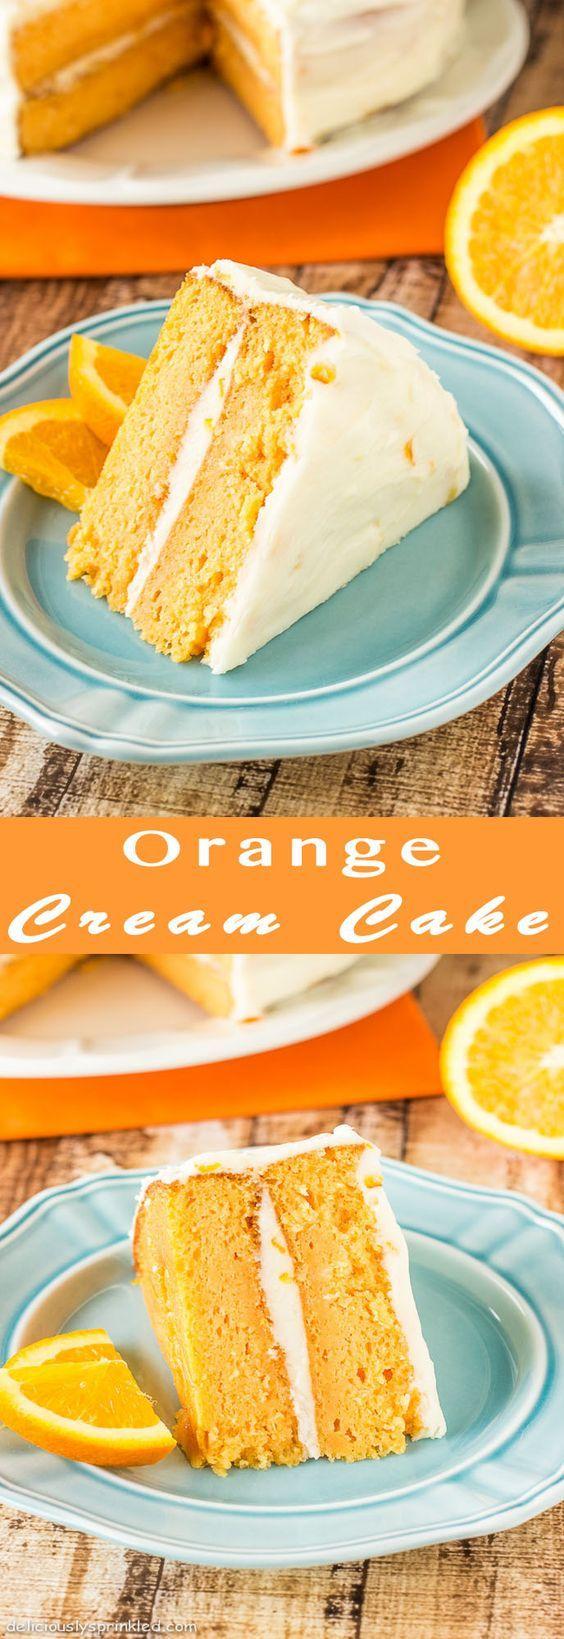 Easy-Orange-Cream-Cake-deliciouslysprinkled.com_.jpg 688×2,000 pixels